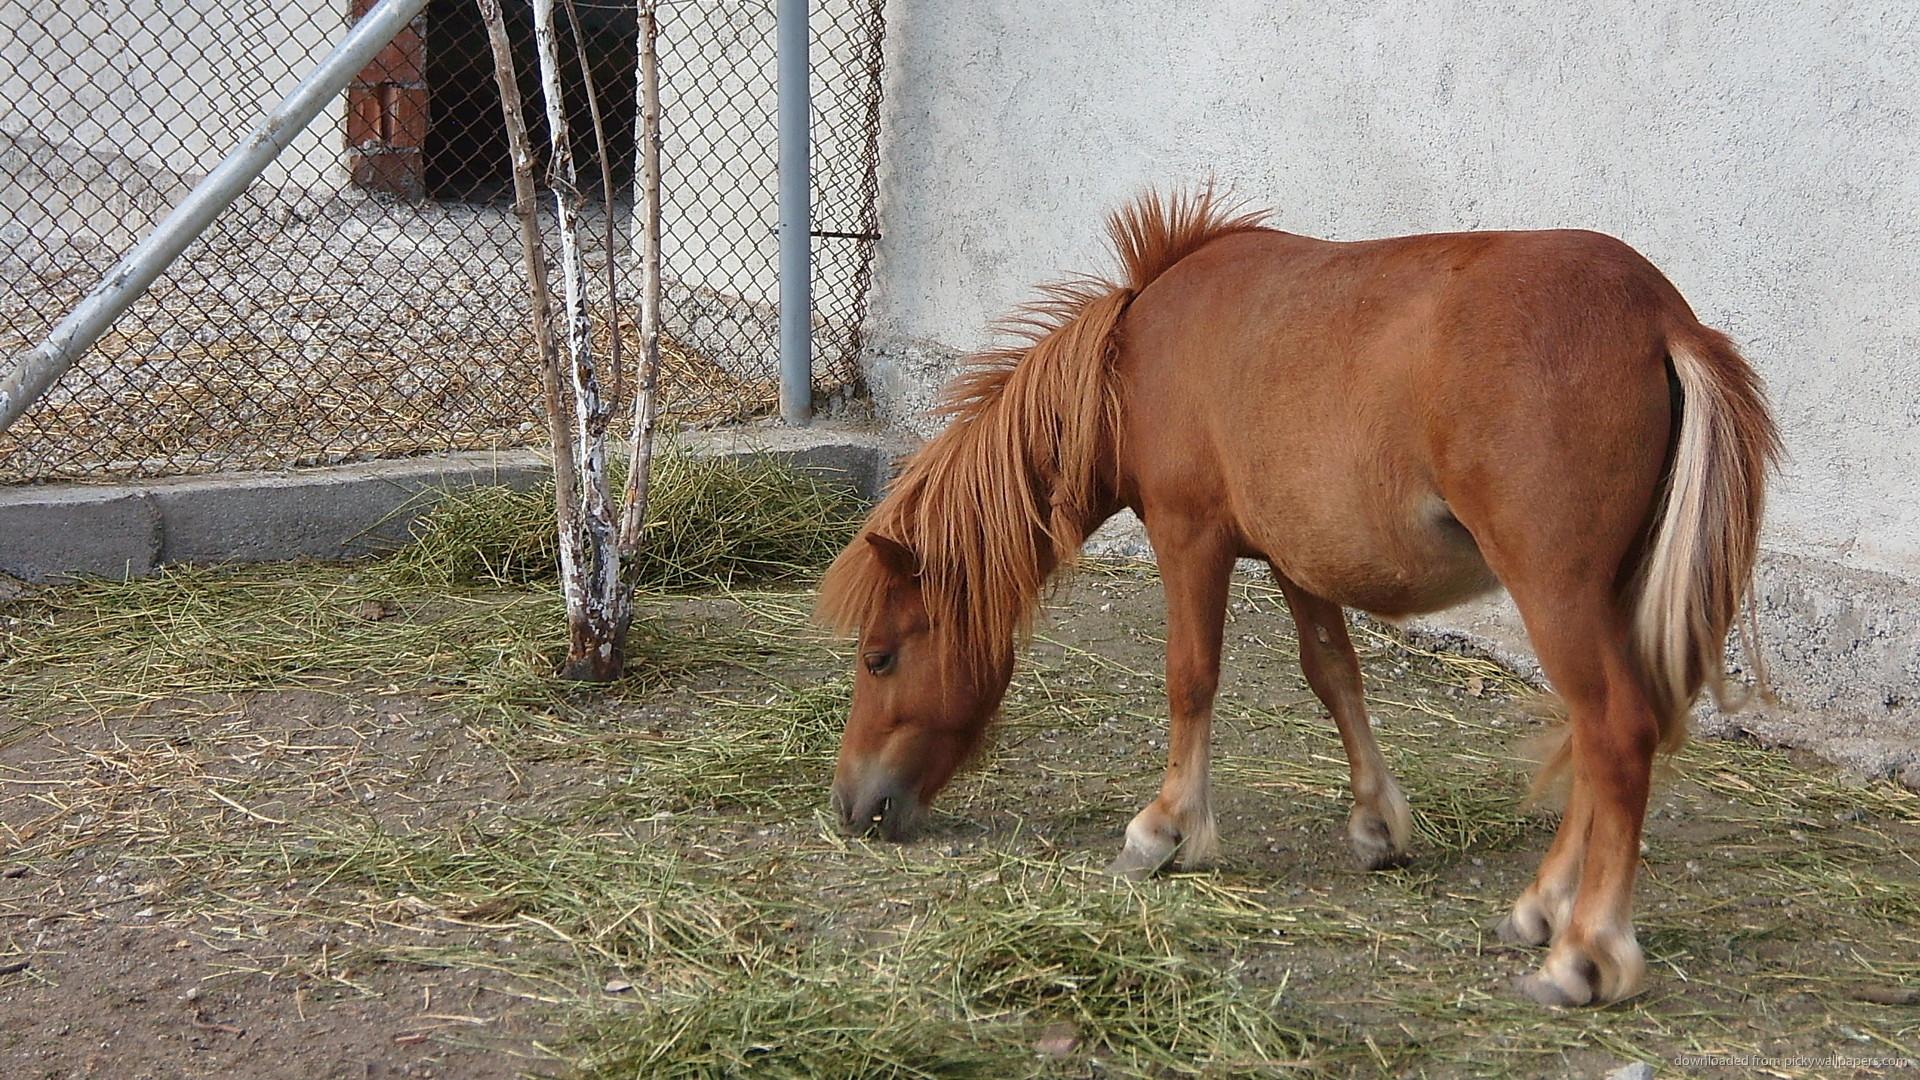 2560x1600 Pony Wallpaper 1920x1080